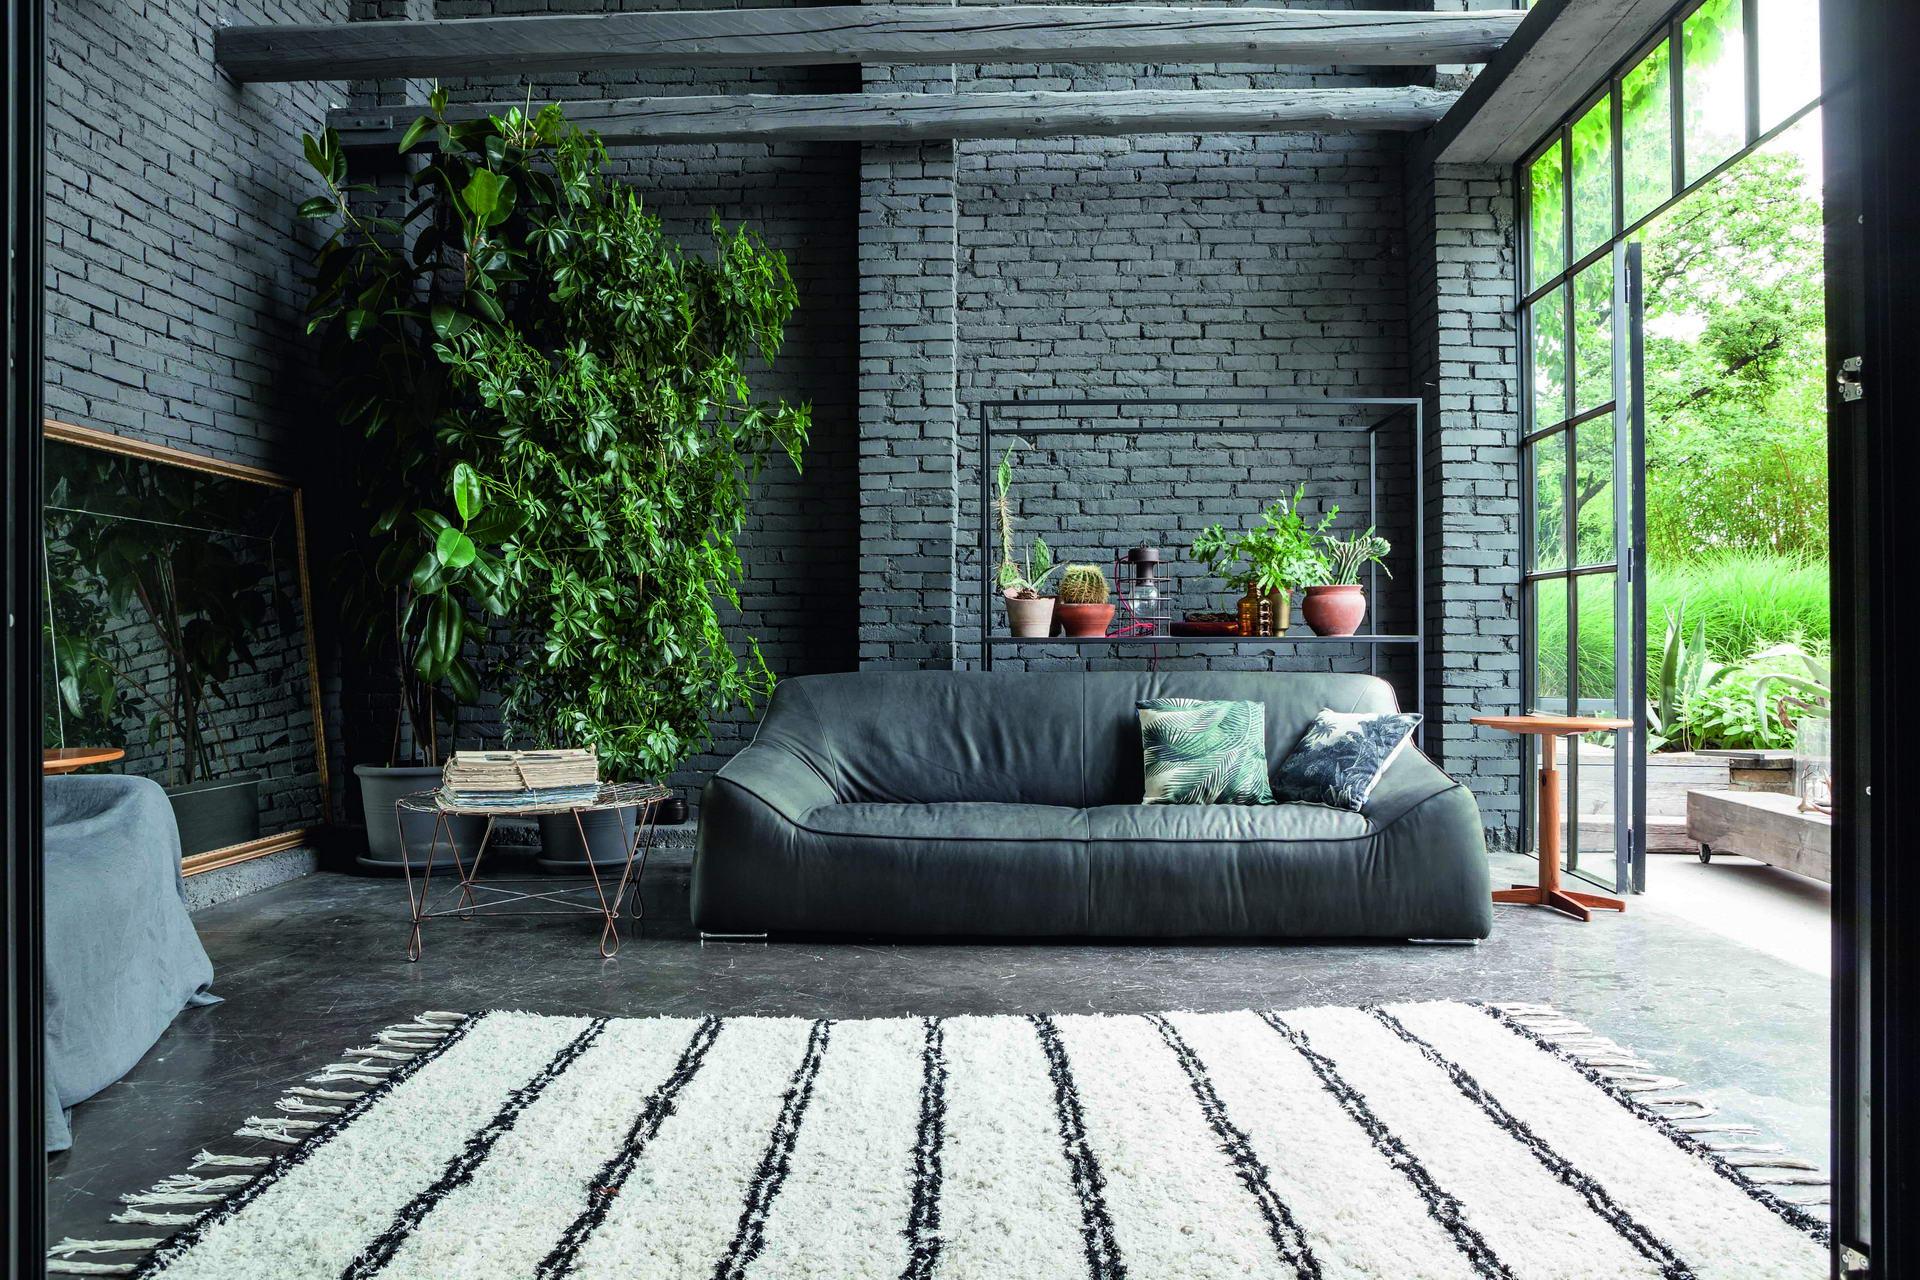 Mueble tapizado clásico en azul